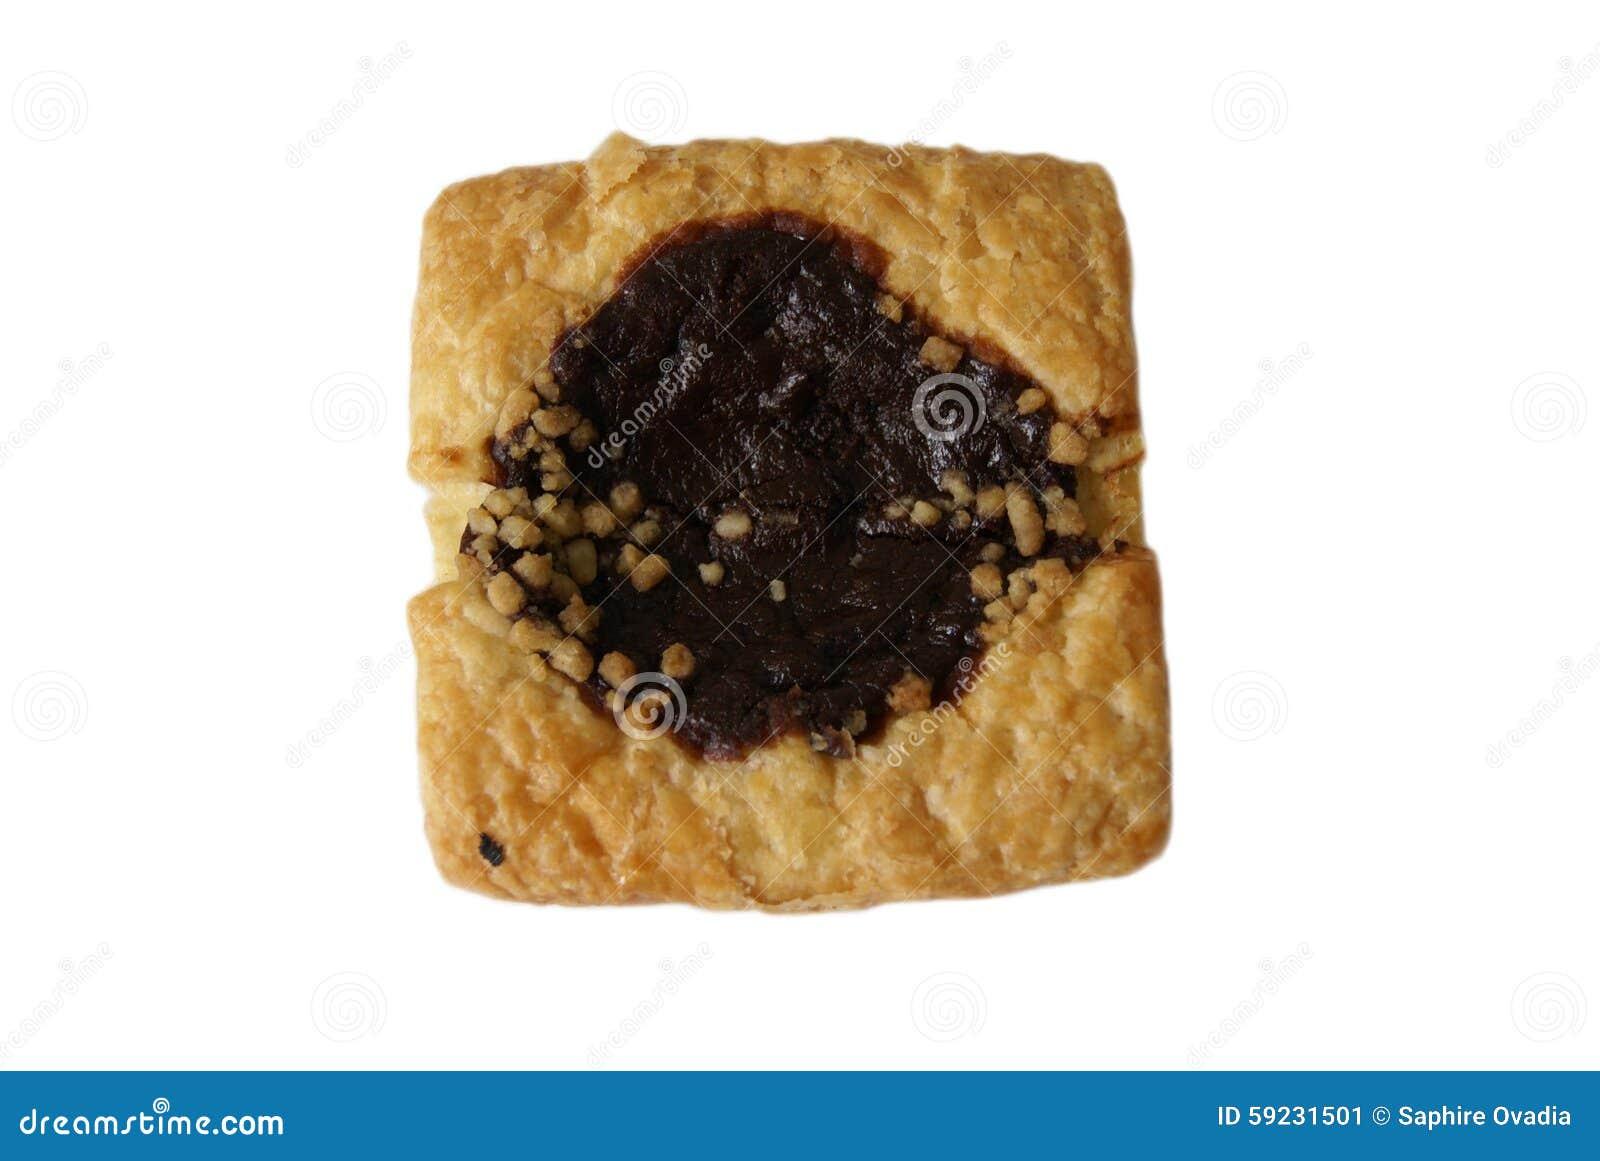 Download Pasteles del chocolate imagen de archivo. Imagen de dulce - 59231501